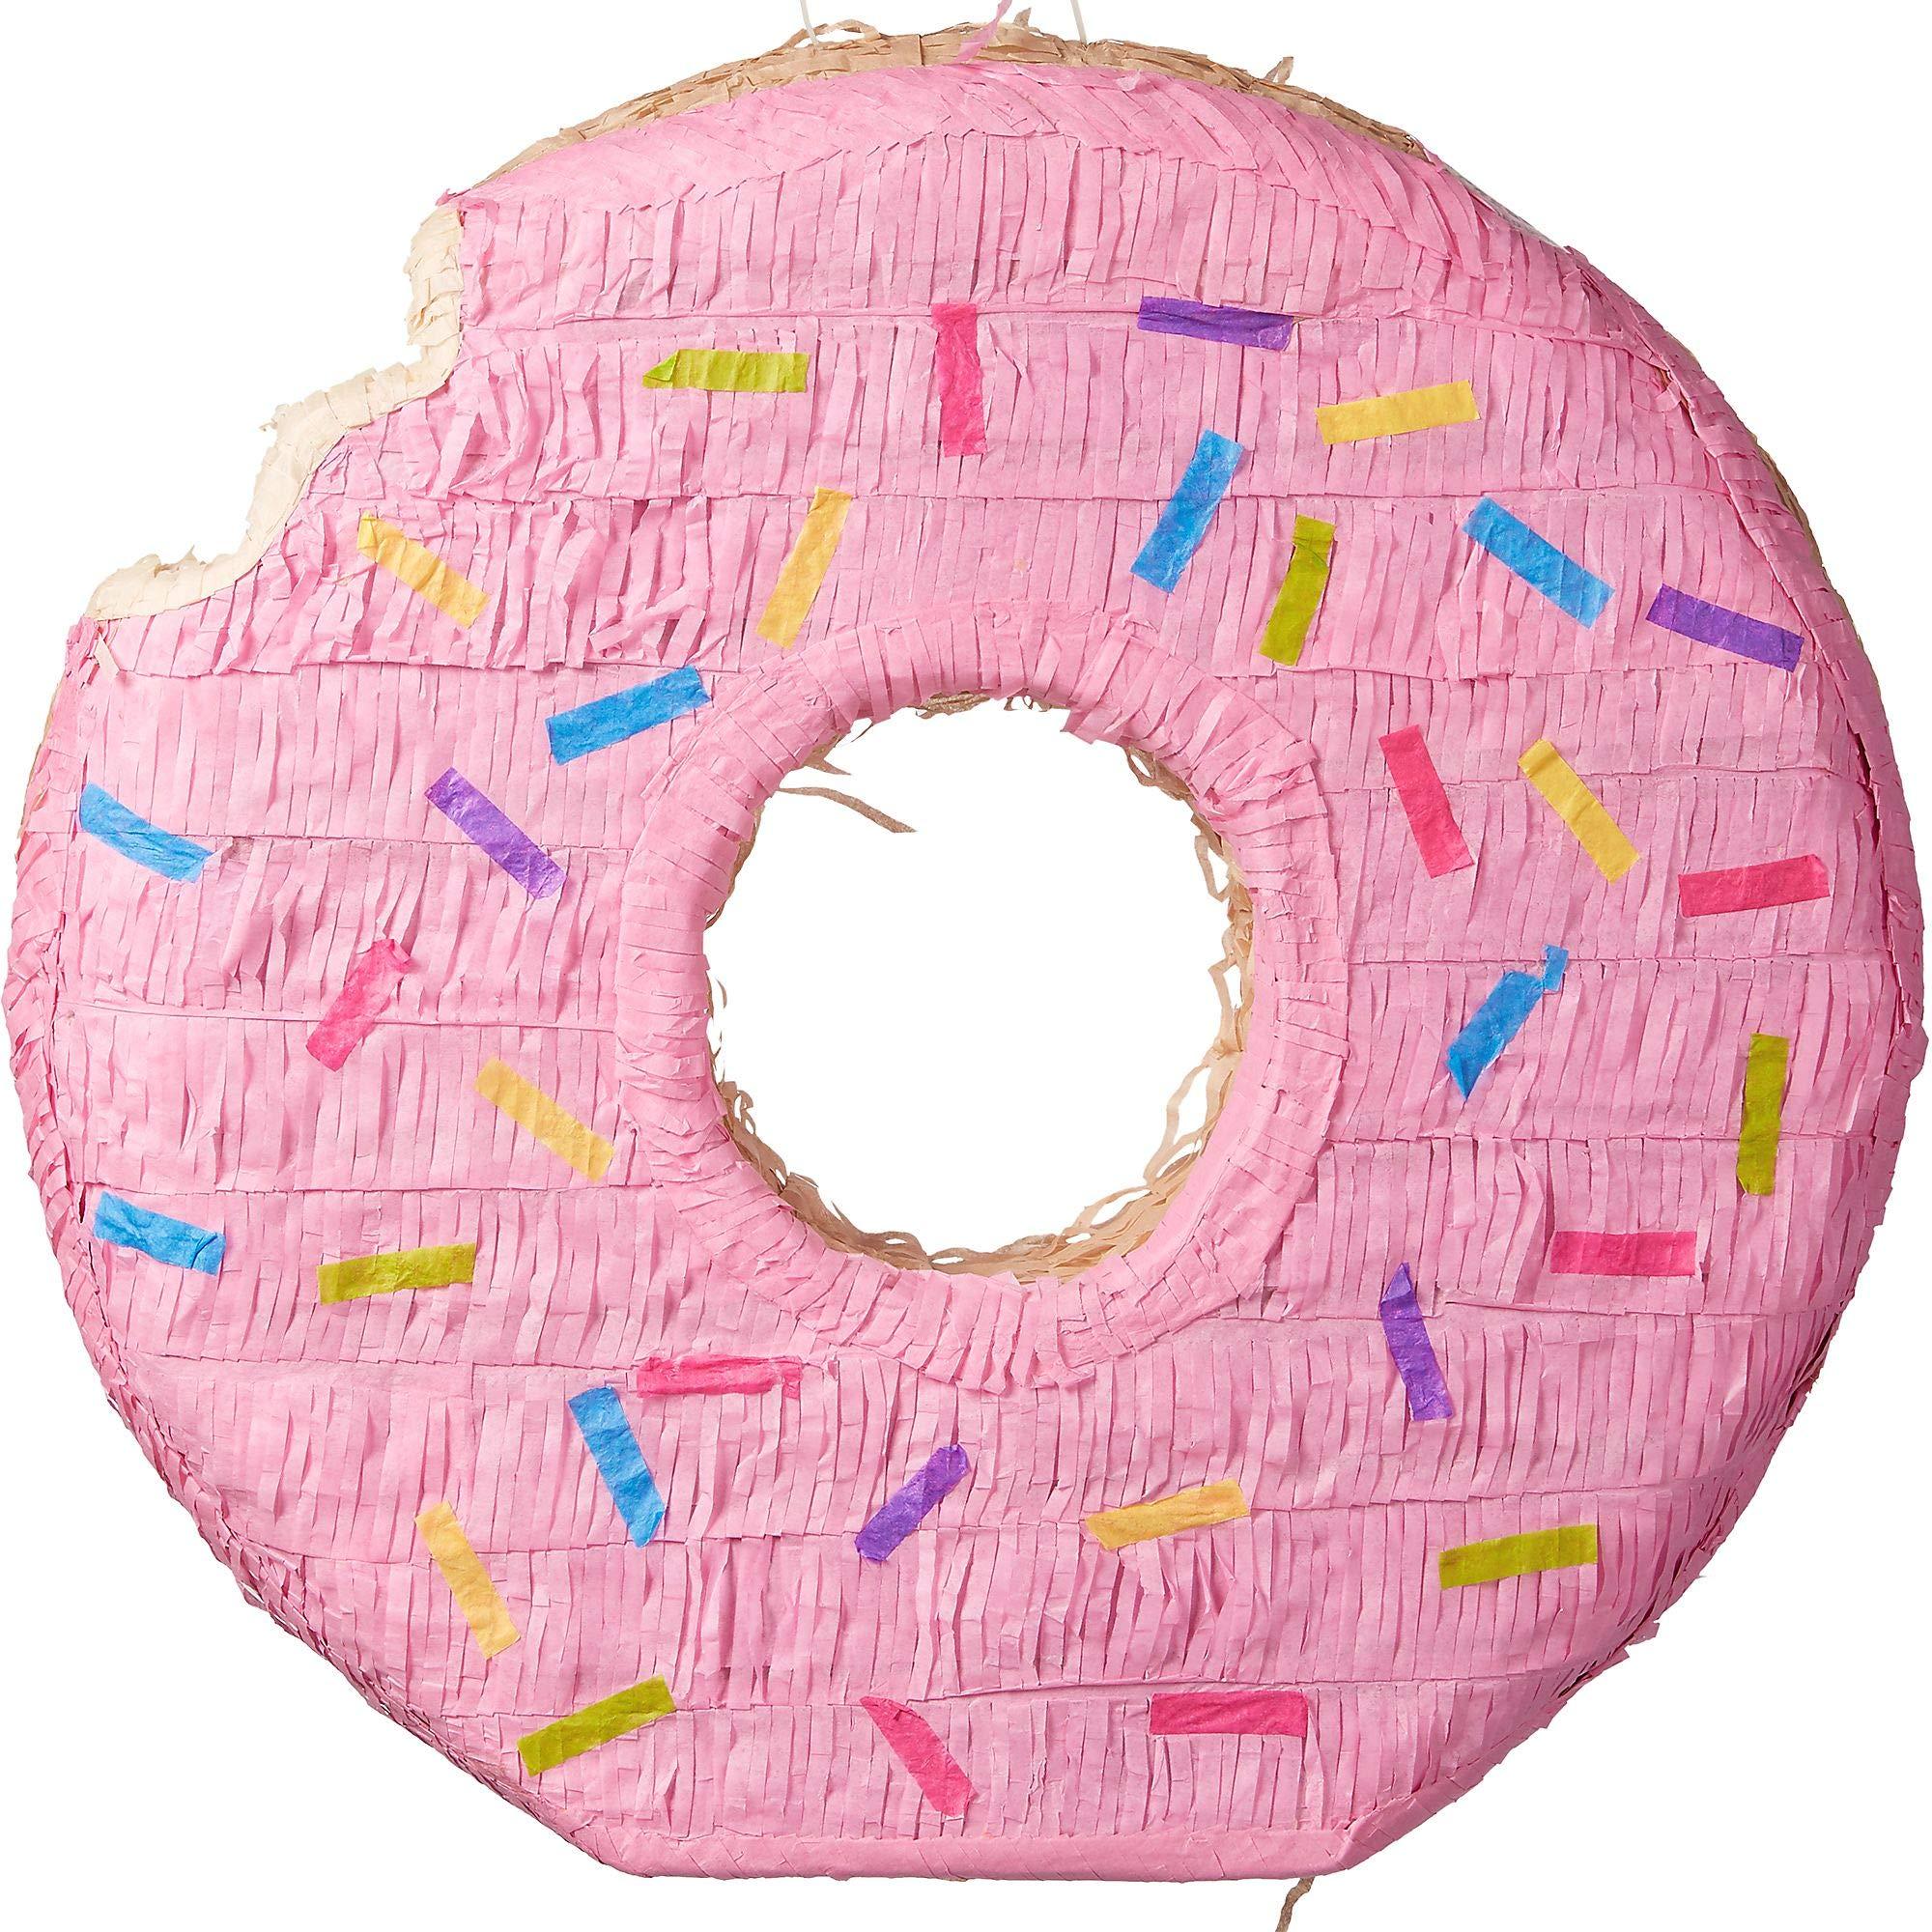 Pink Donut Pinata (1) by Ya Otta Pinata